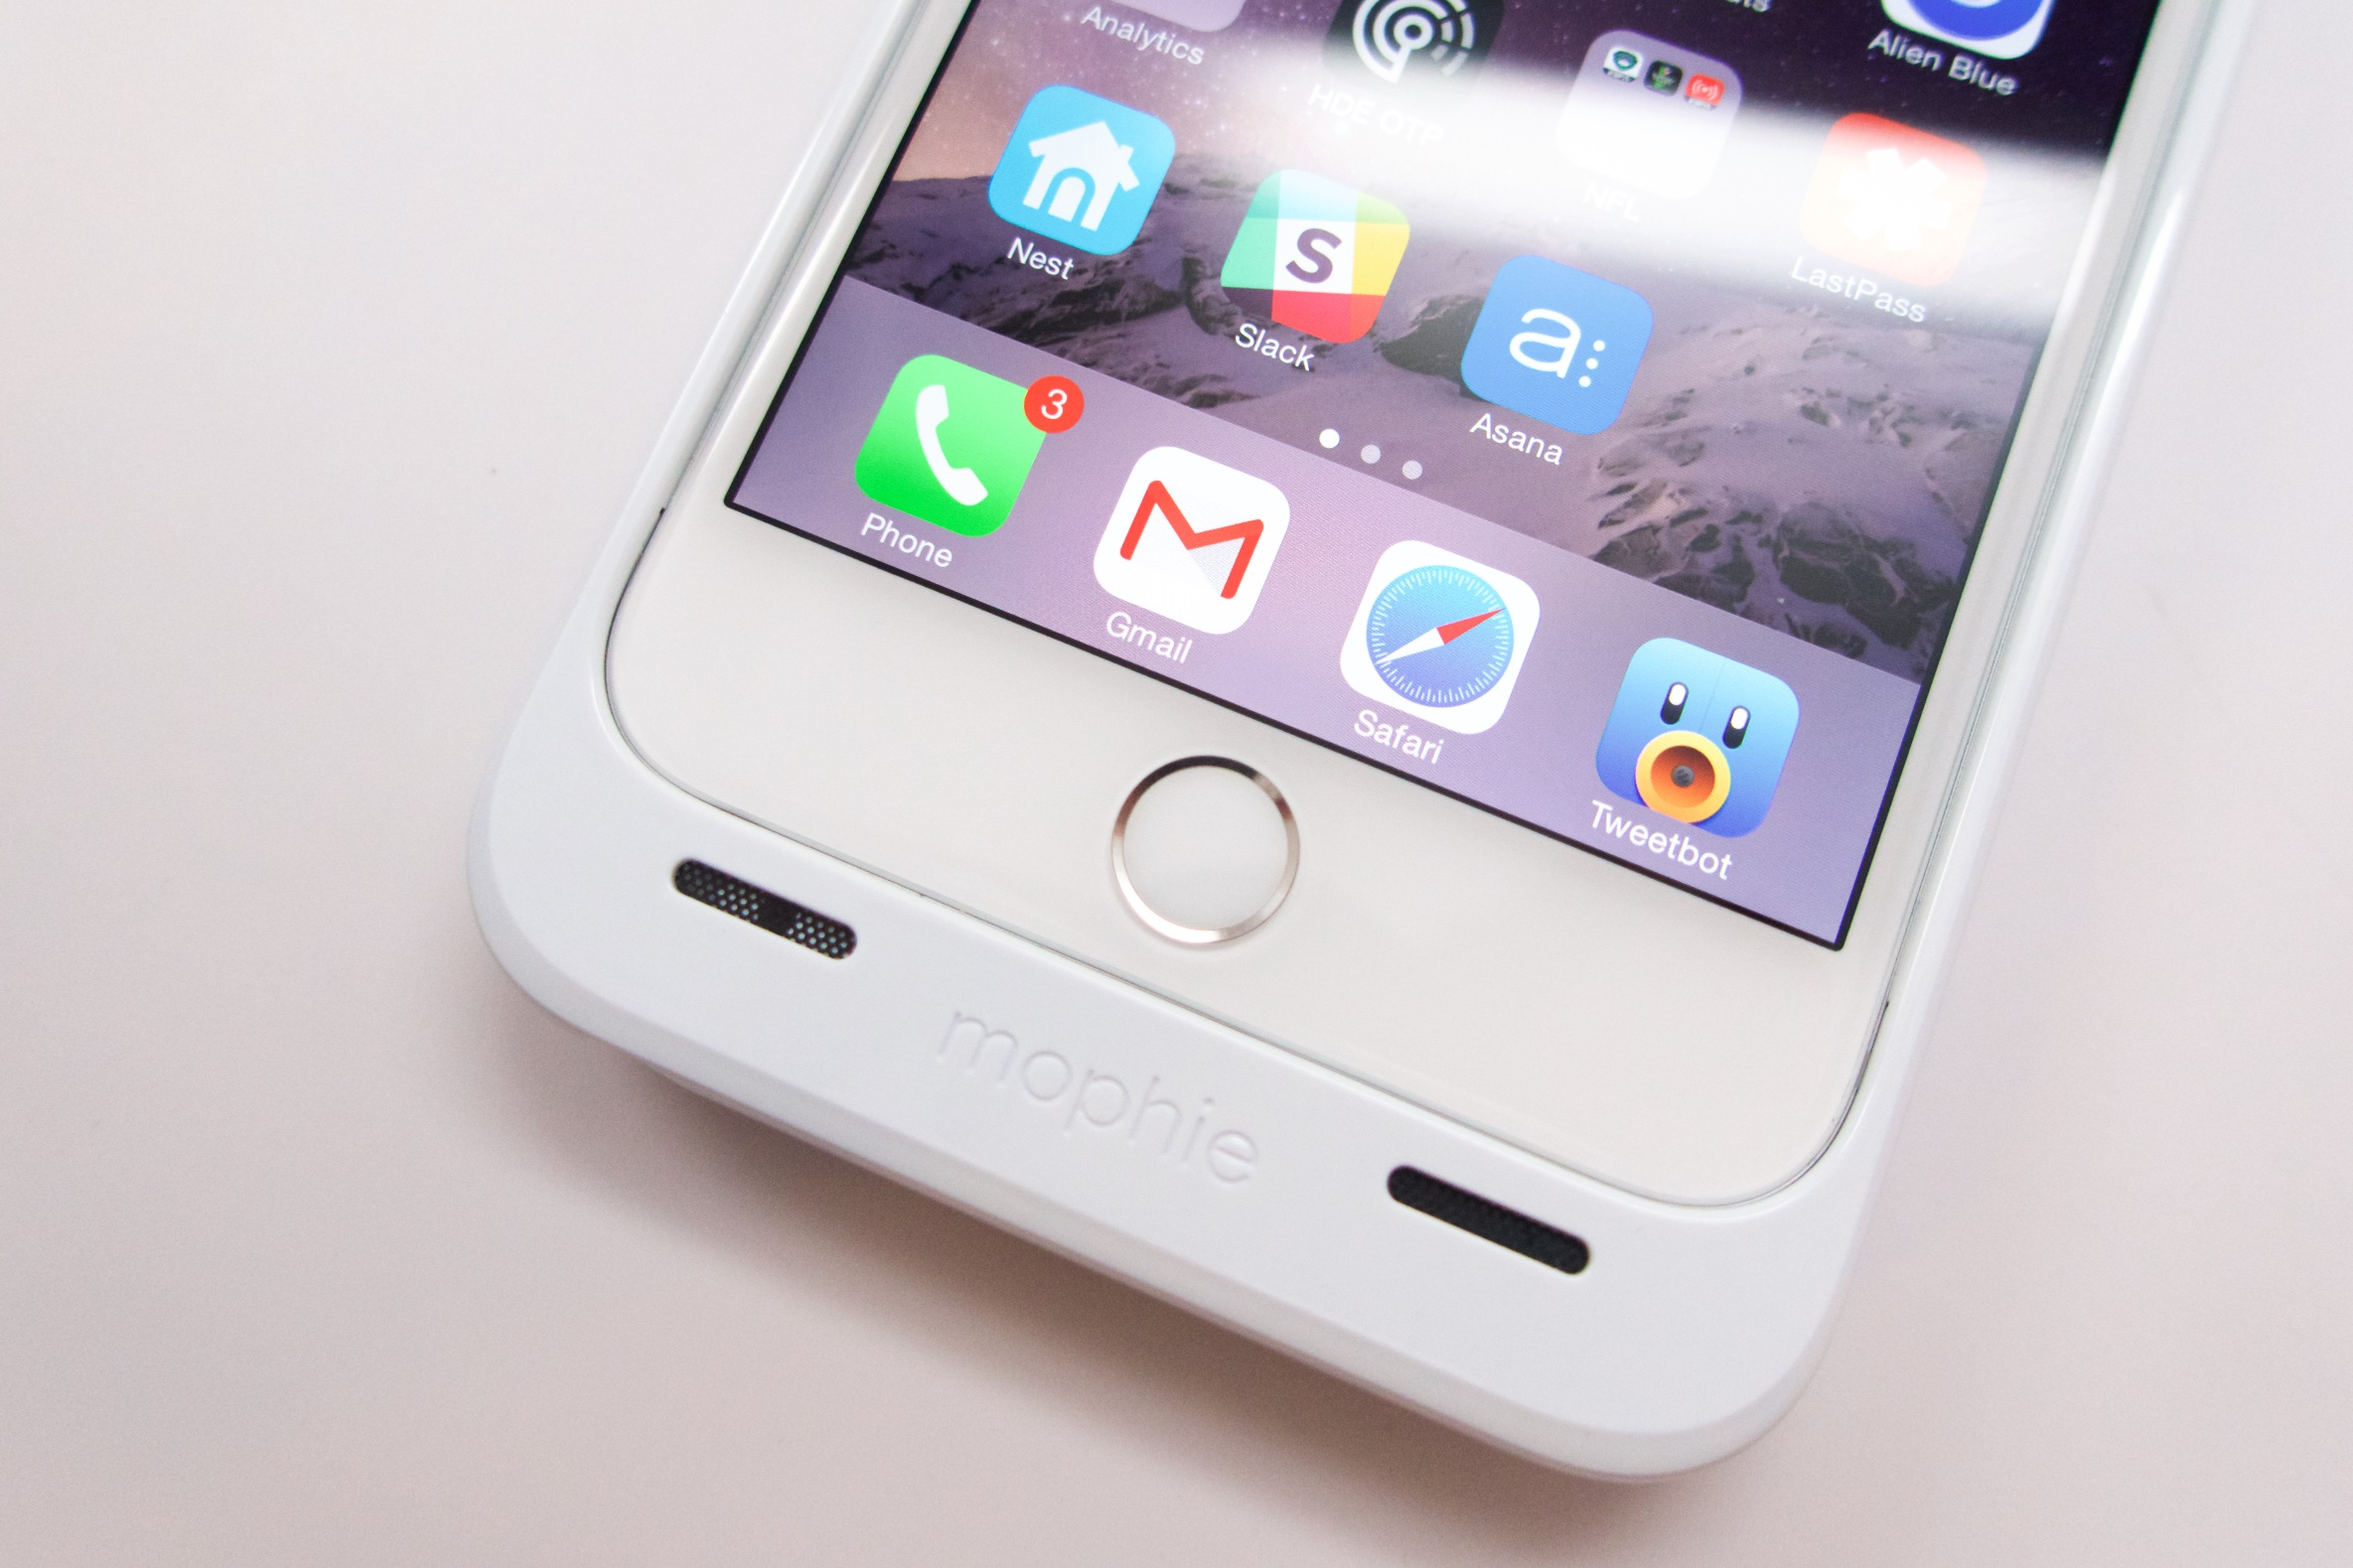 super popular 5c536 28dd1 Mophie iPhone 6 Plus Case Review